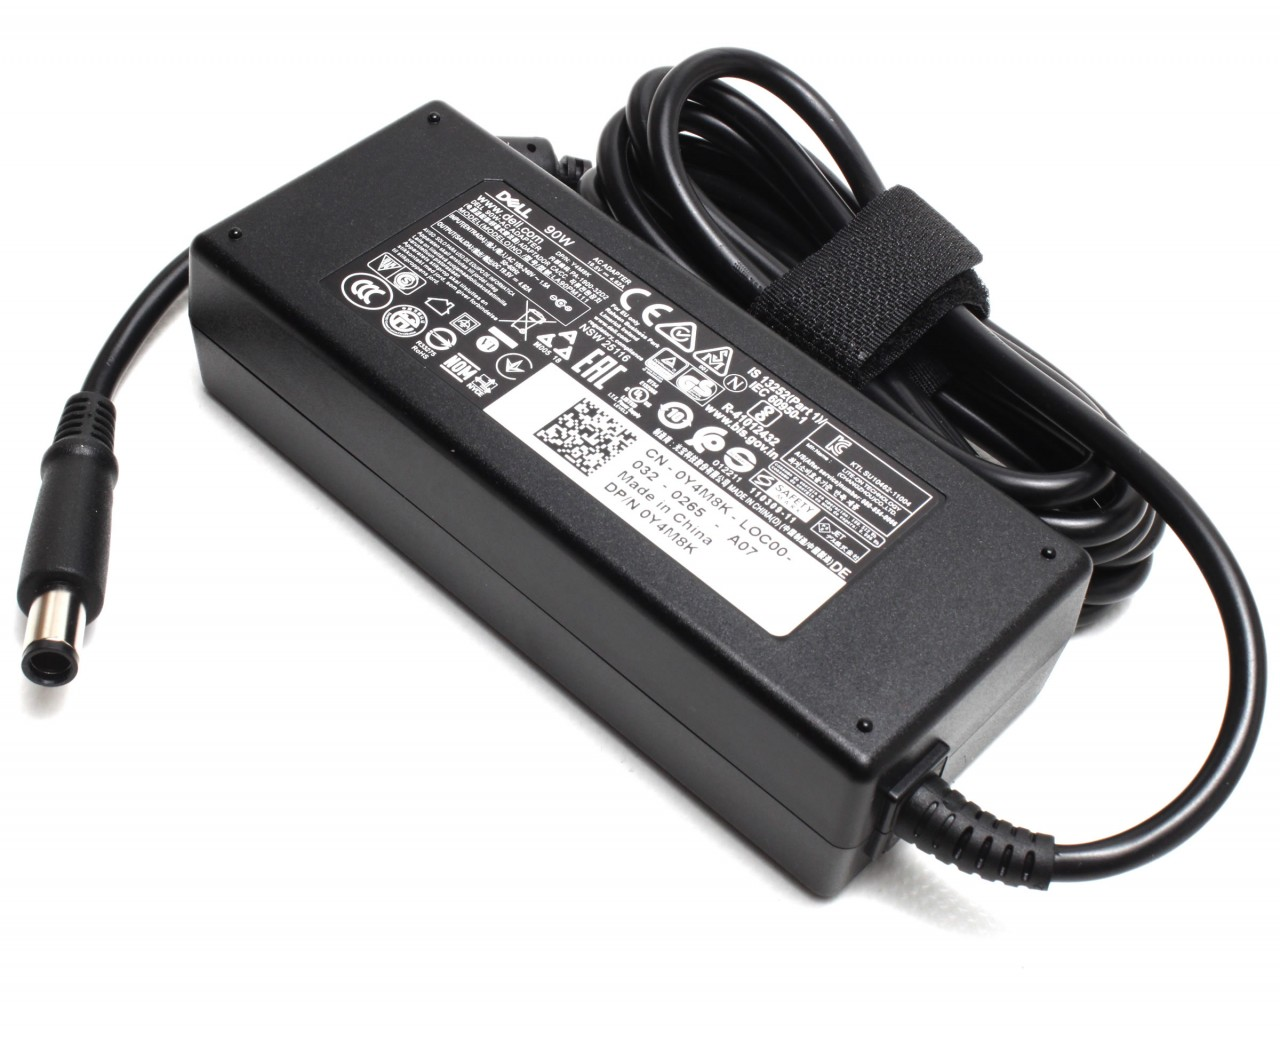 Incarcator Dell Inspiron One 2310 VARIANTA 3 imagine powerlaptop.ro 2021